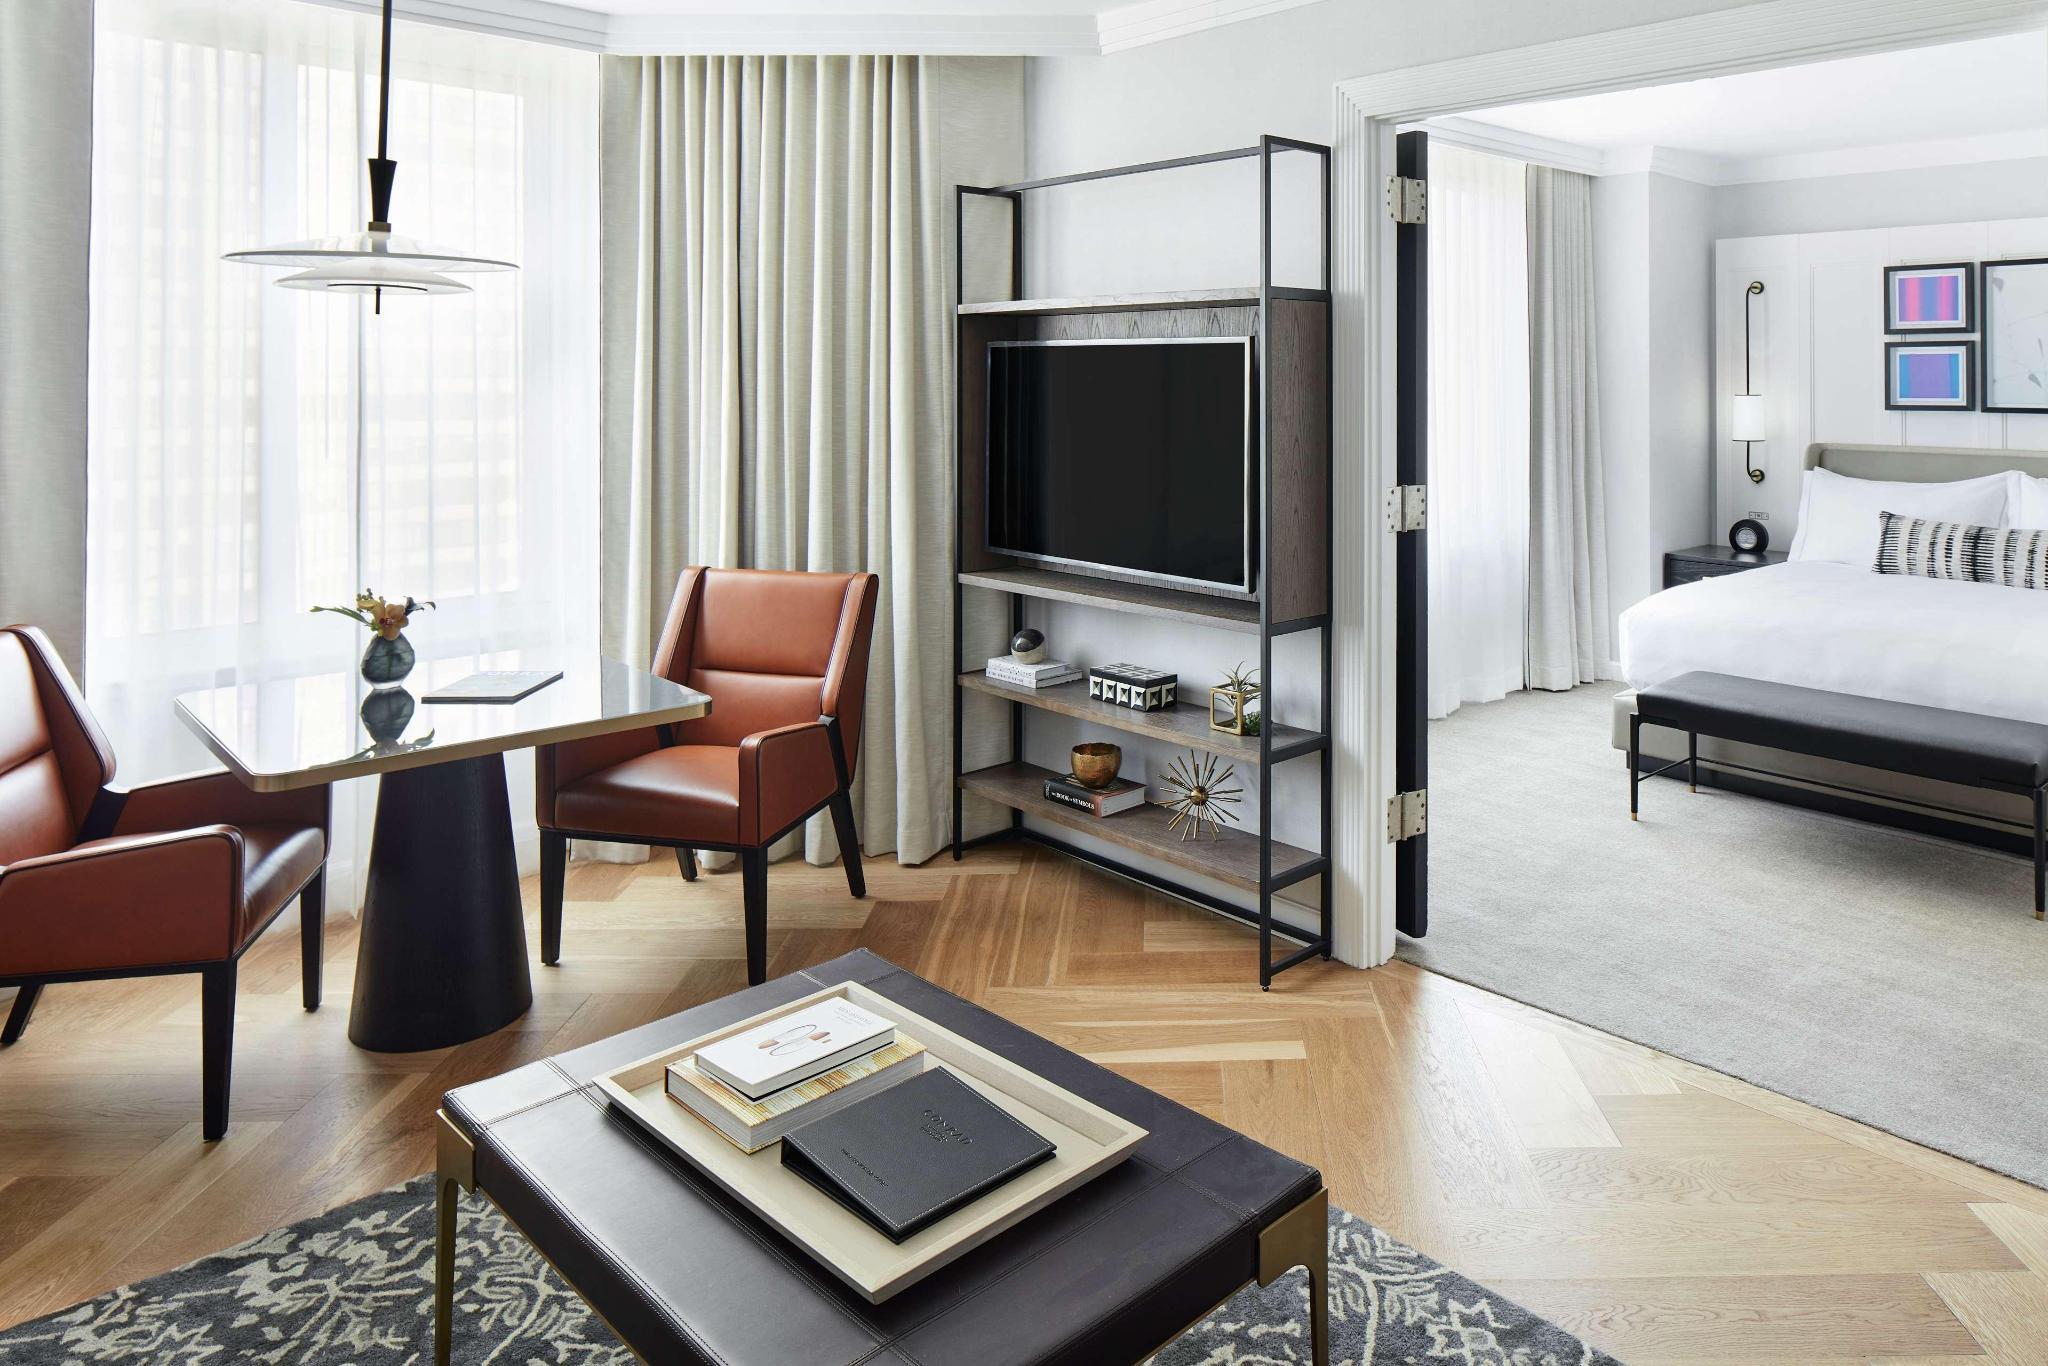 City View 1 Bedroom Suite - 1 King Bed